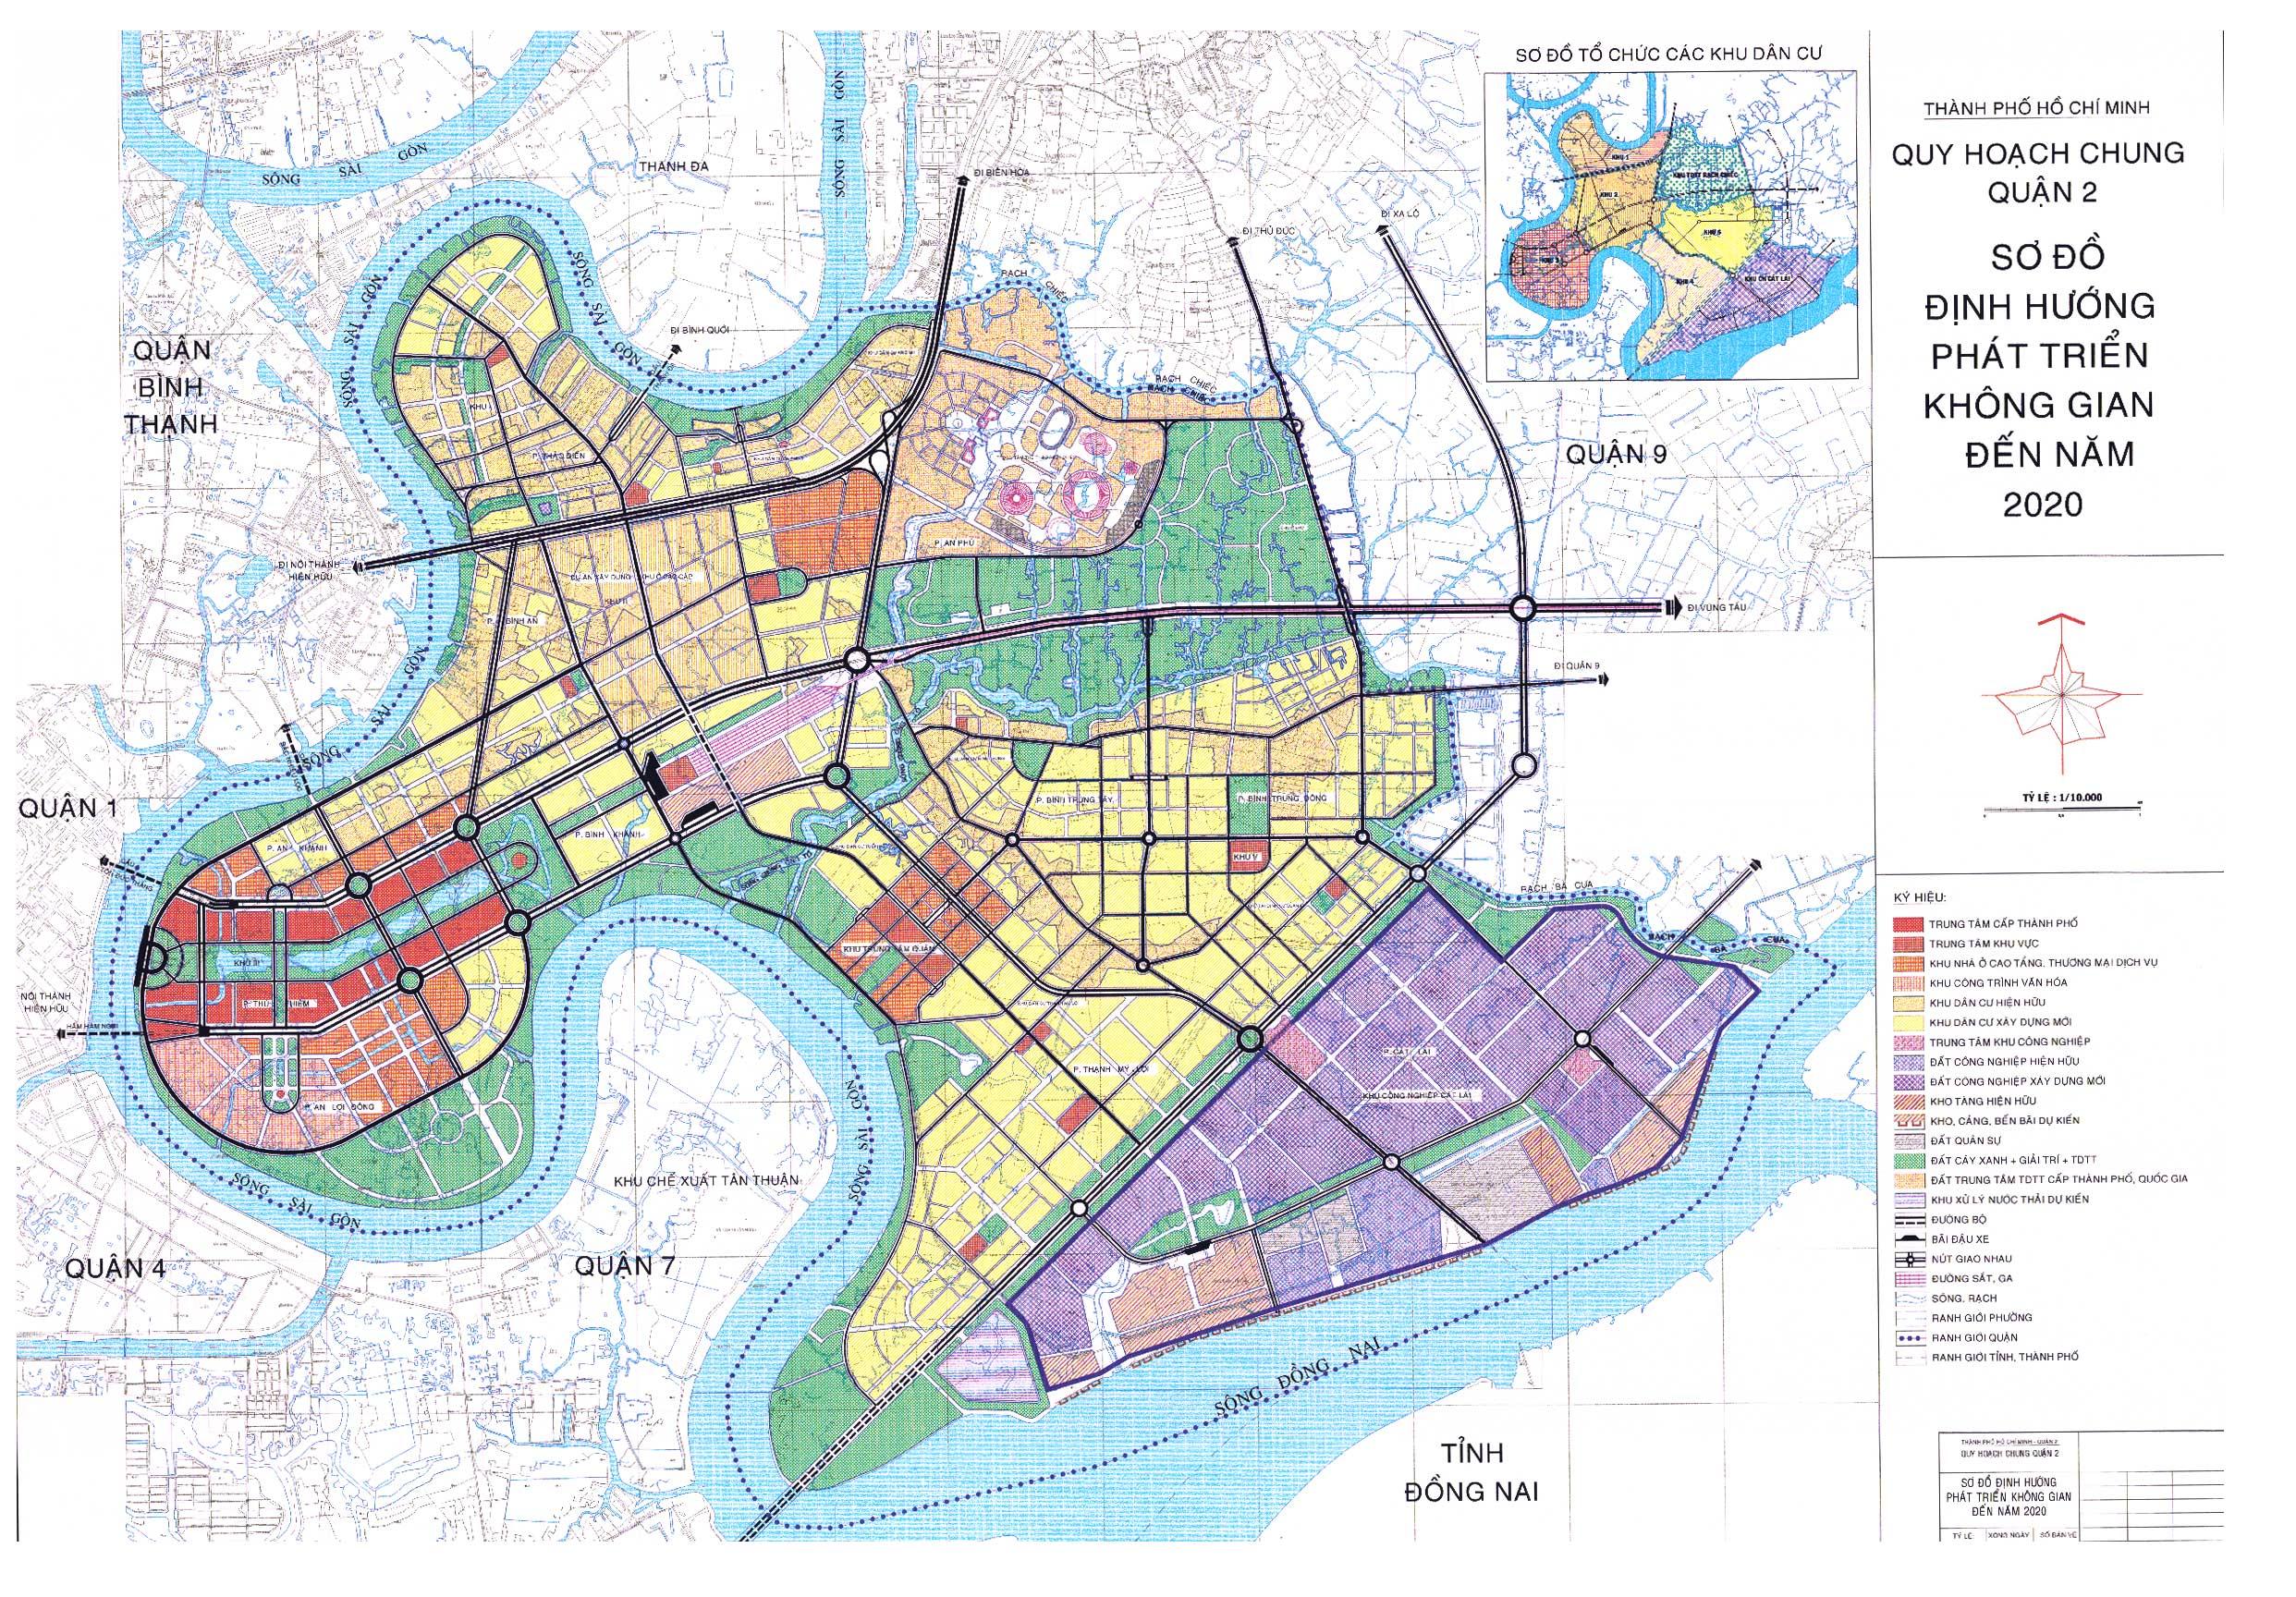 bản đồ quy hoạch quận 2